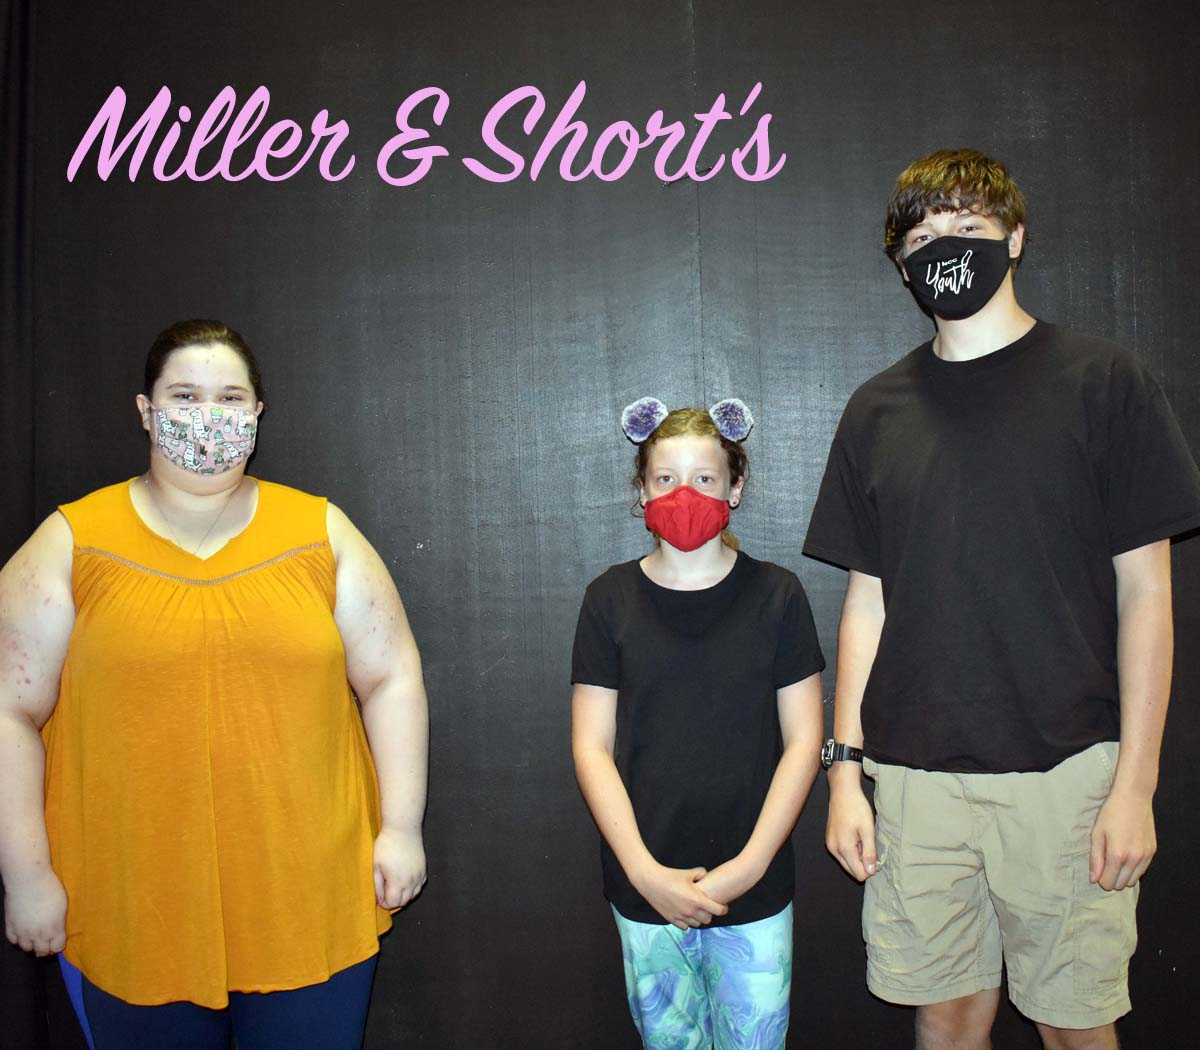 miller & Short